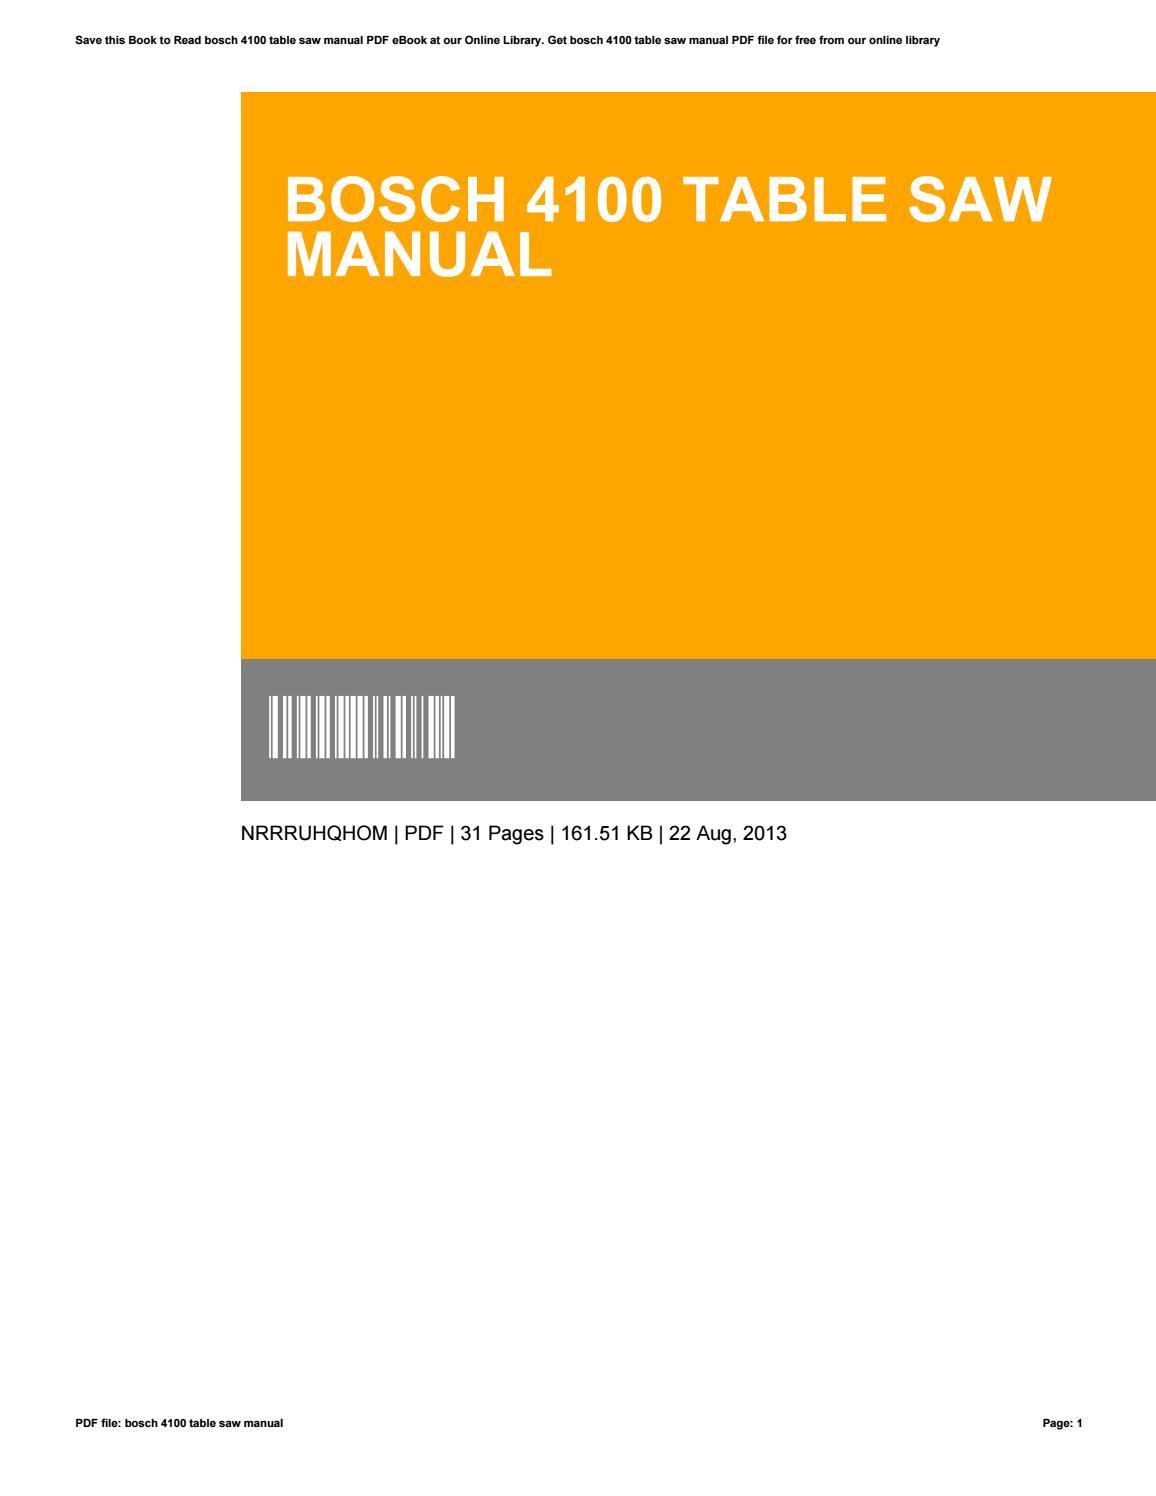 Bosch 4100 manual